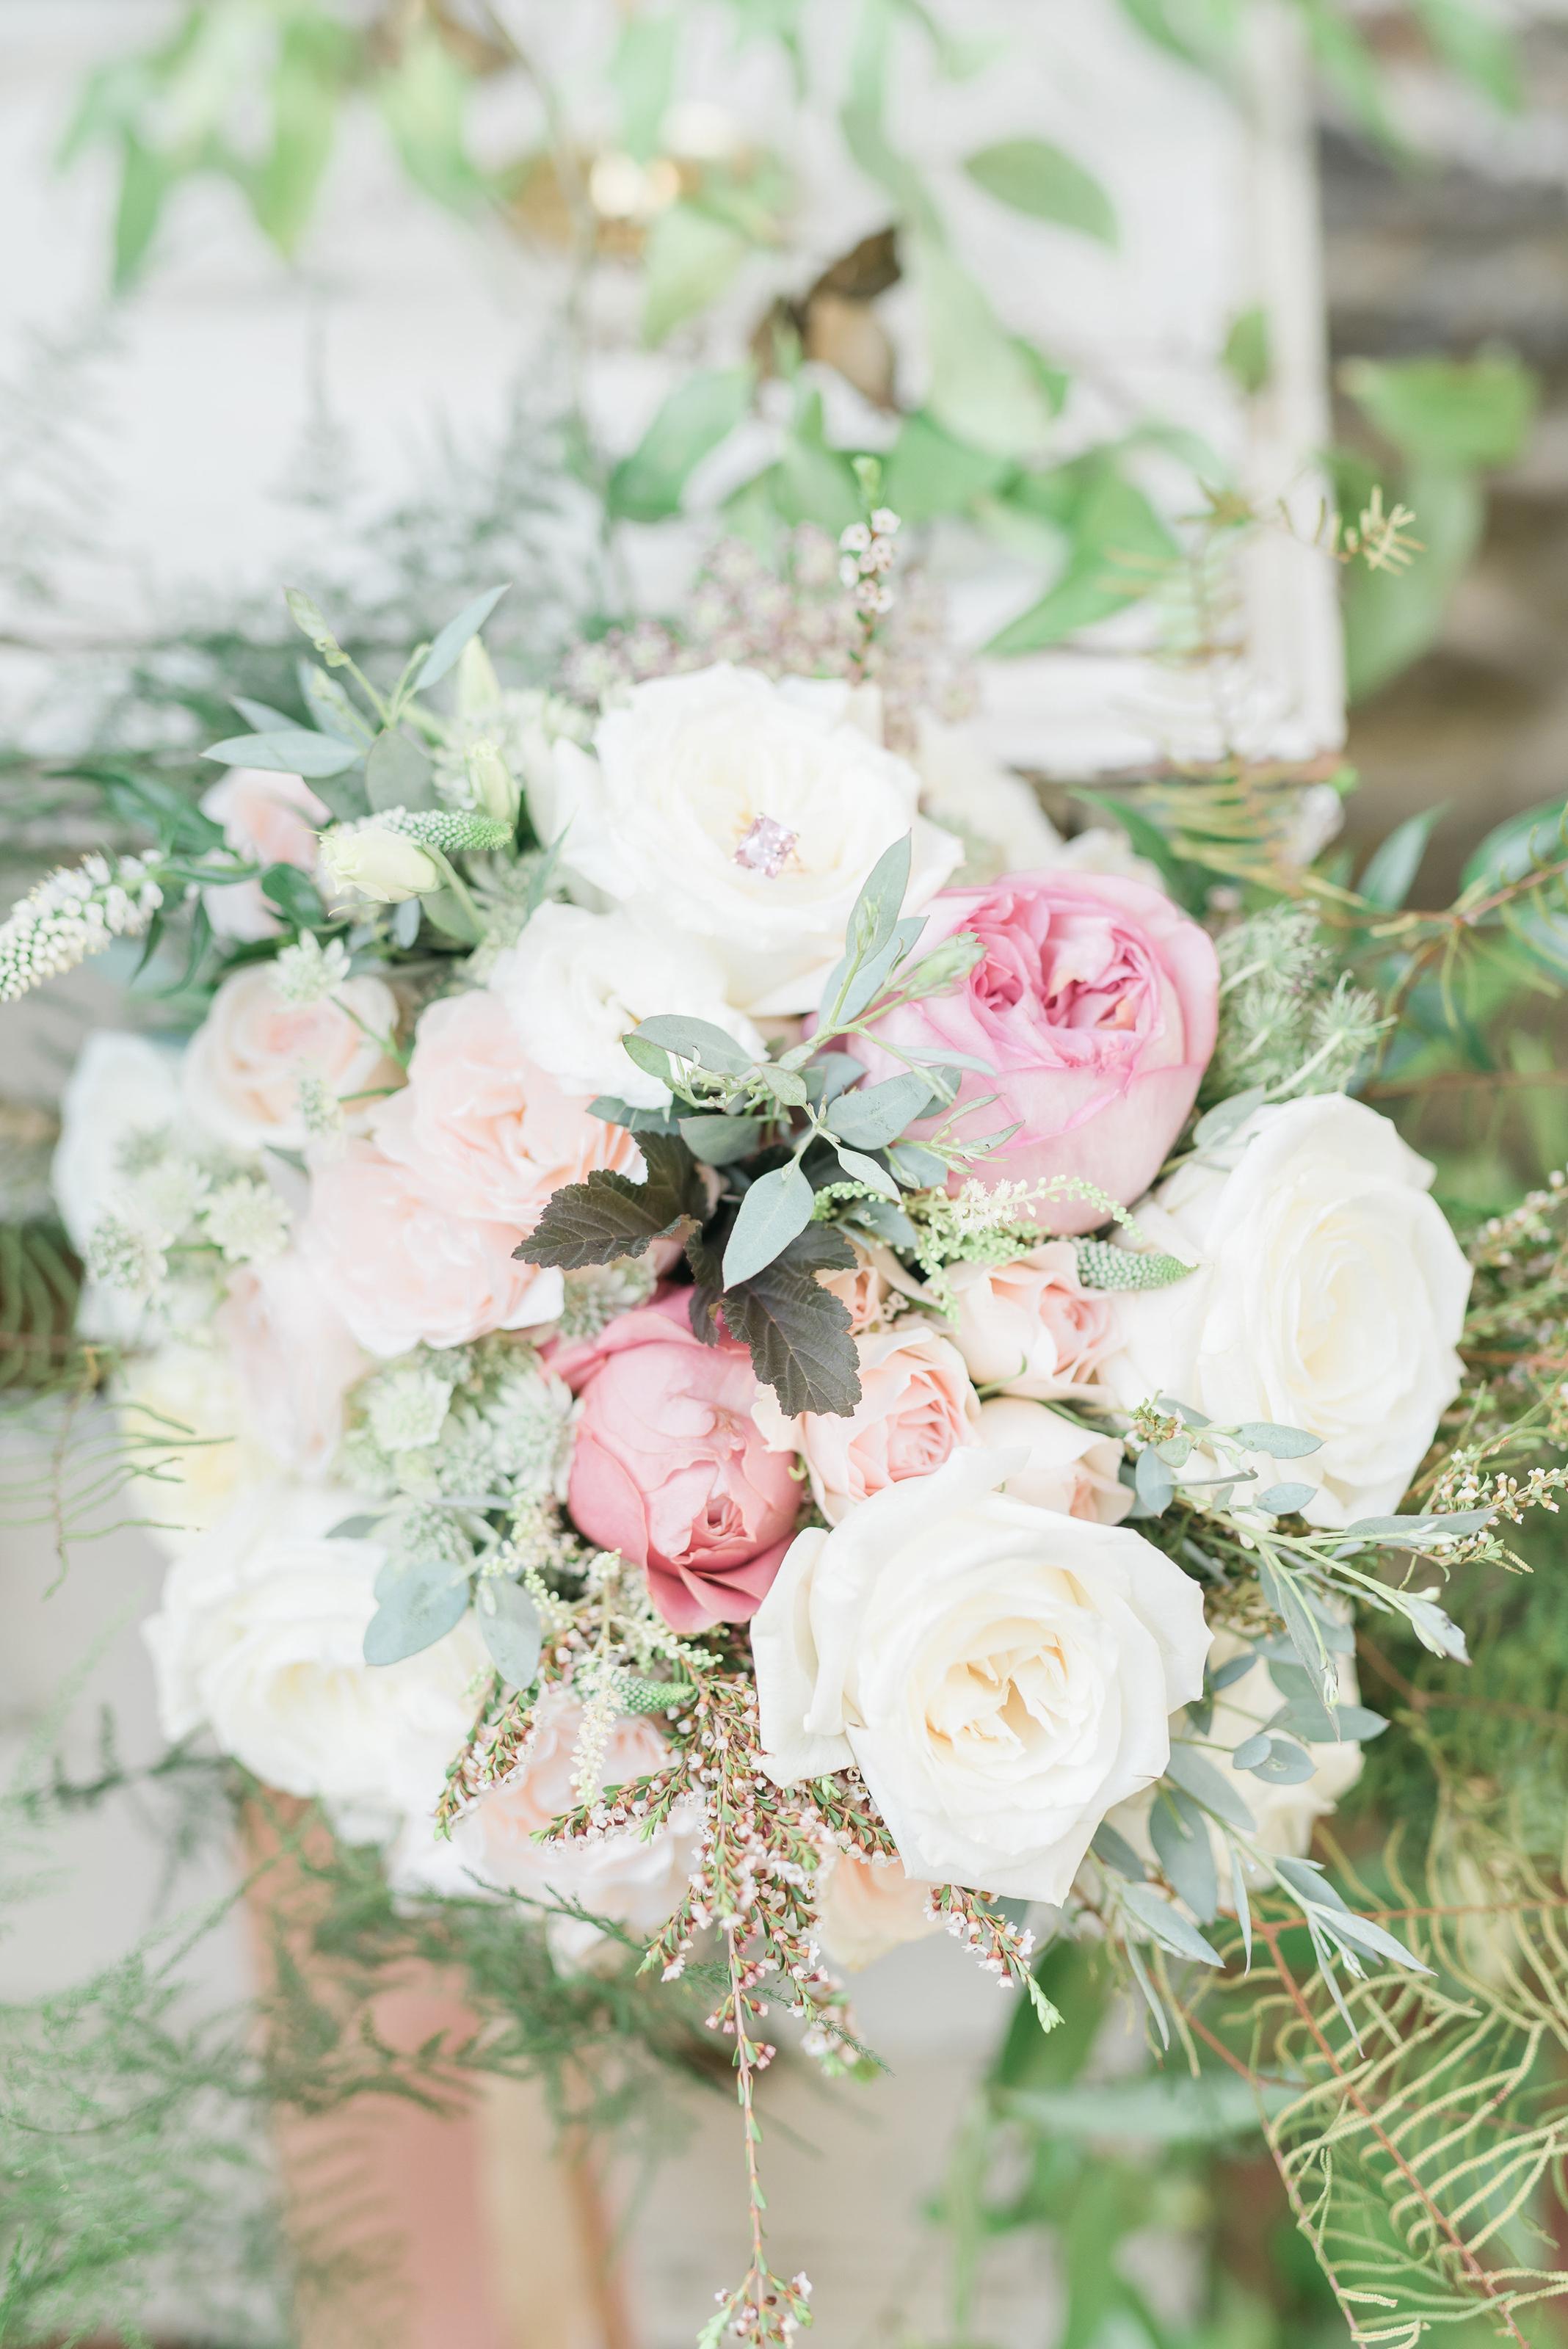 Blush Romantic Shoot Details-0055 - Copy.jpg